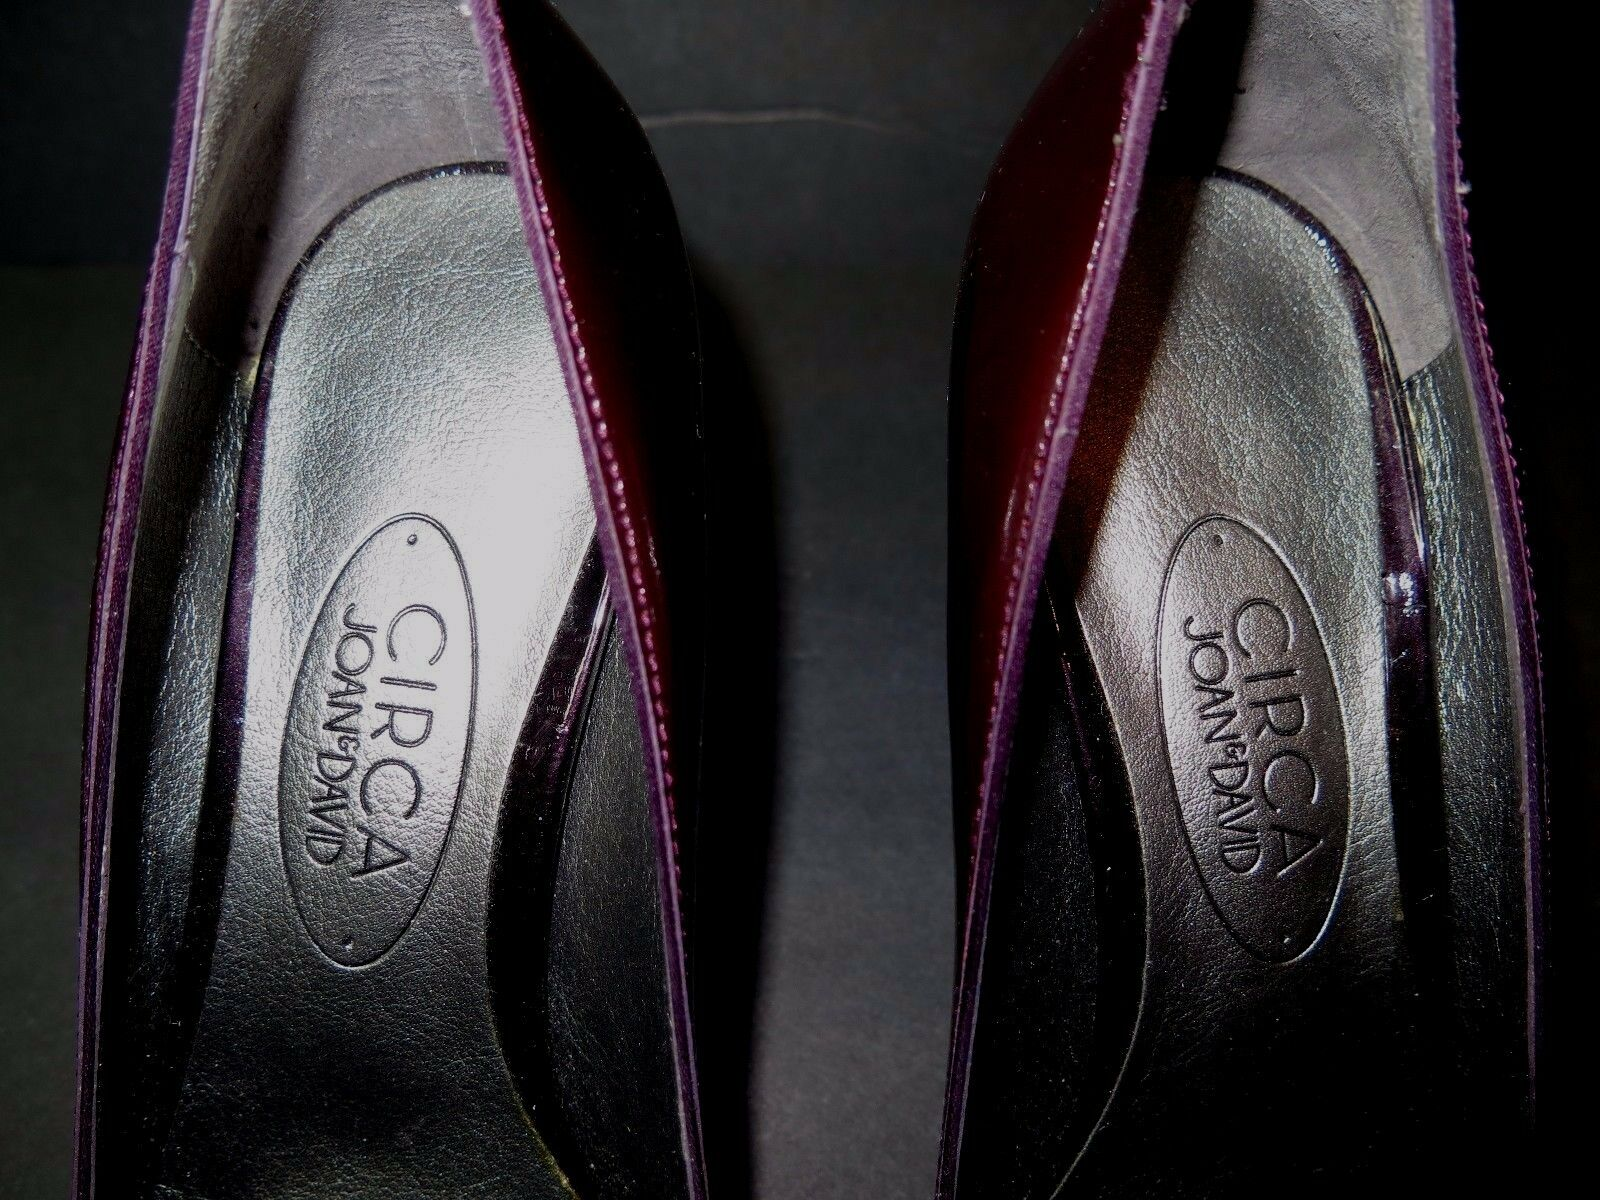 New Beautiful DAVID Designer CIRCA JOAN & DAVID Beautiful Patent Leder Pump Schuhes 7-1/2 M 41e26f